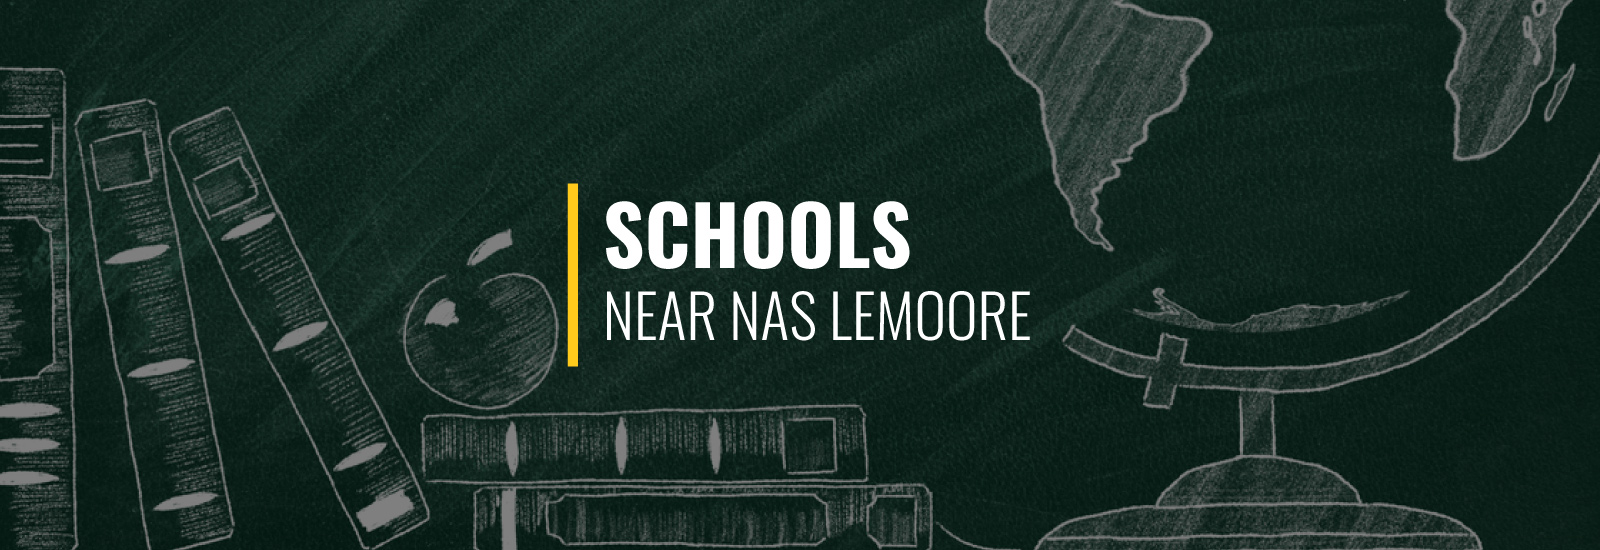 NAS Lemoore Schools